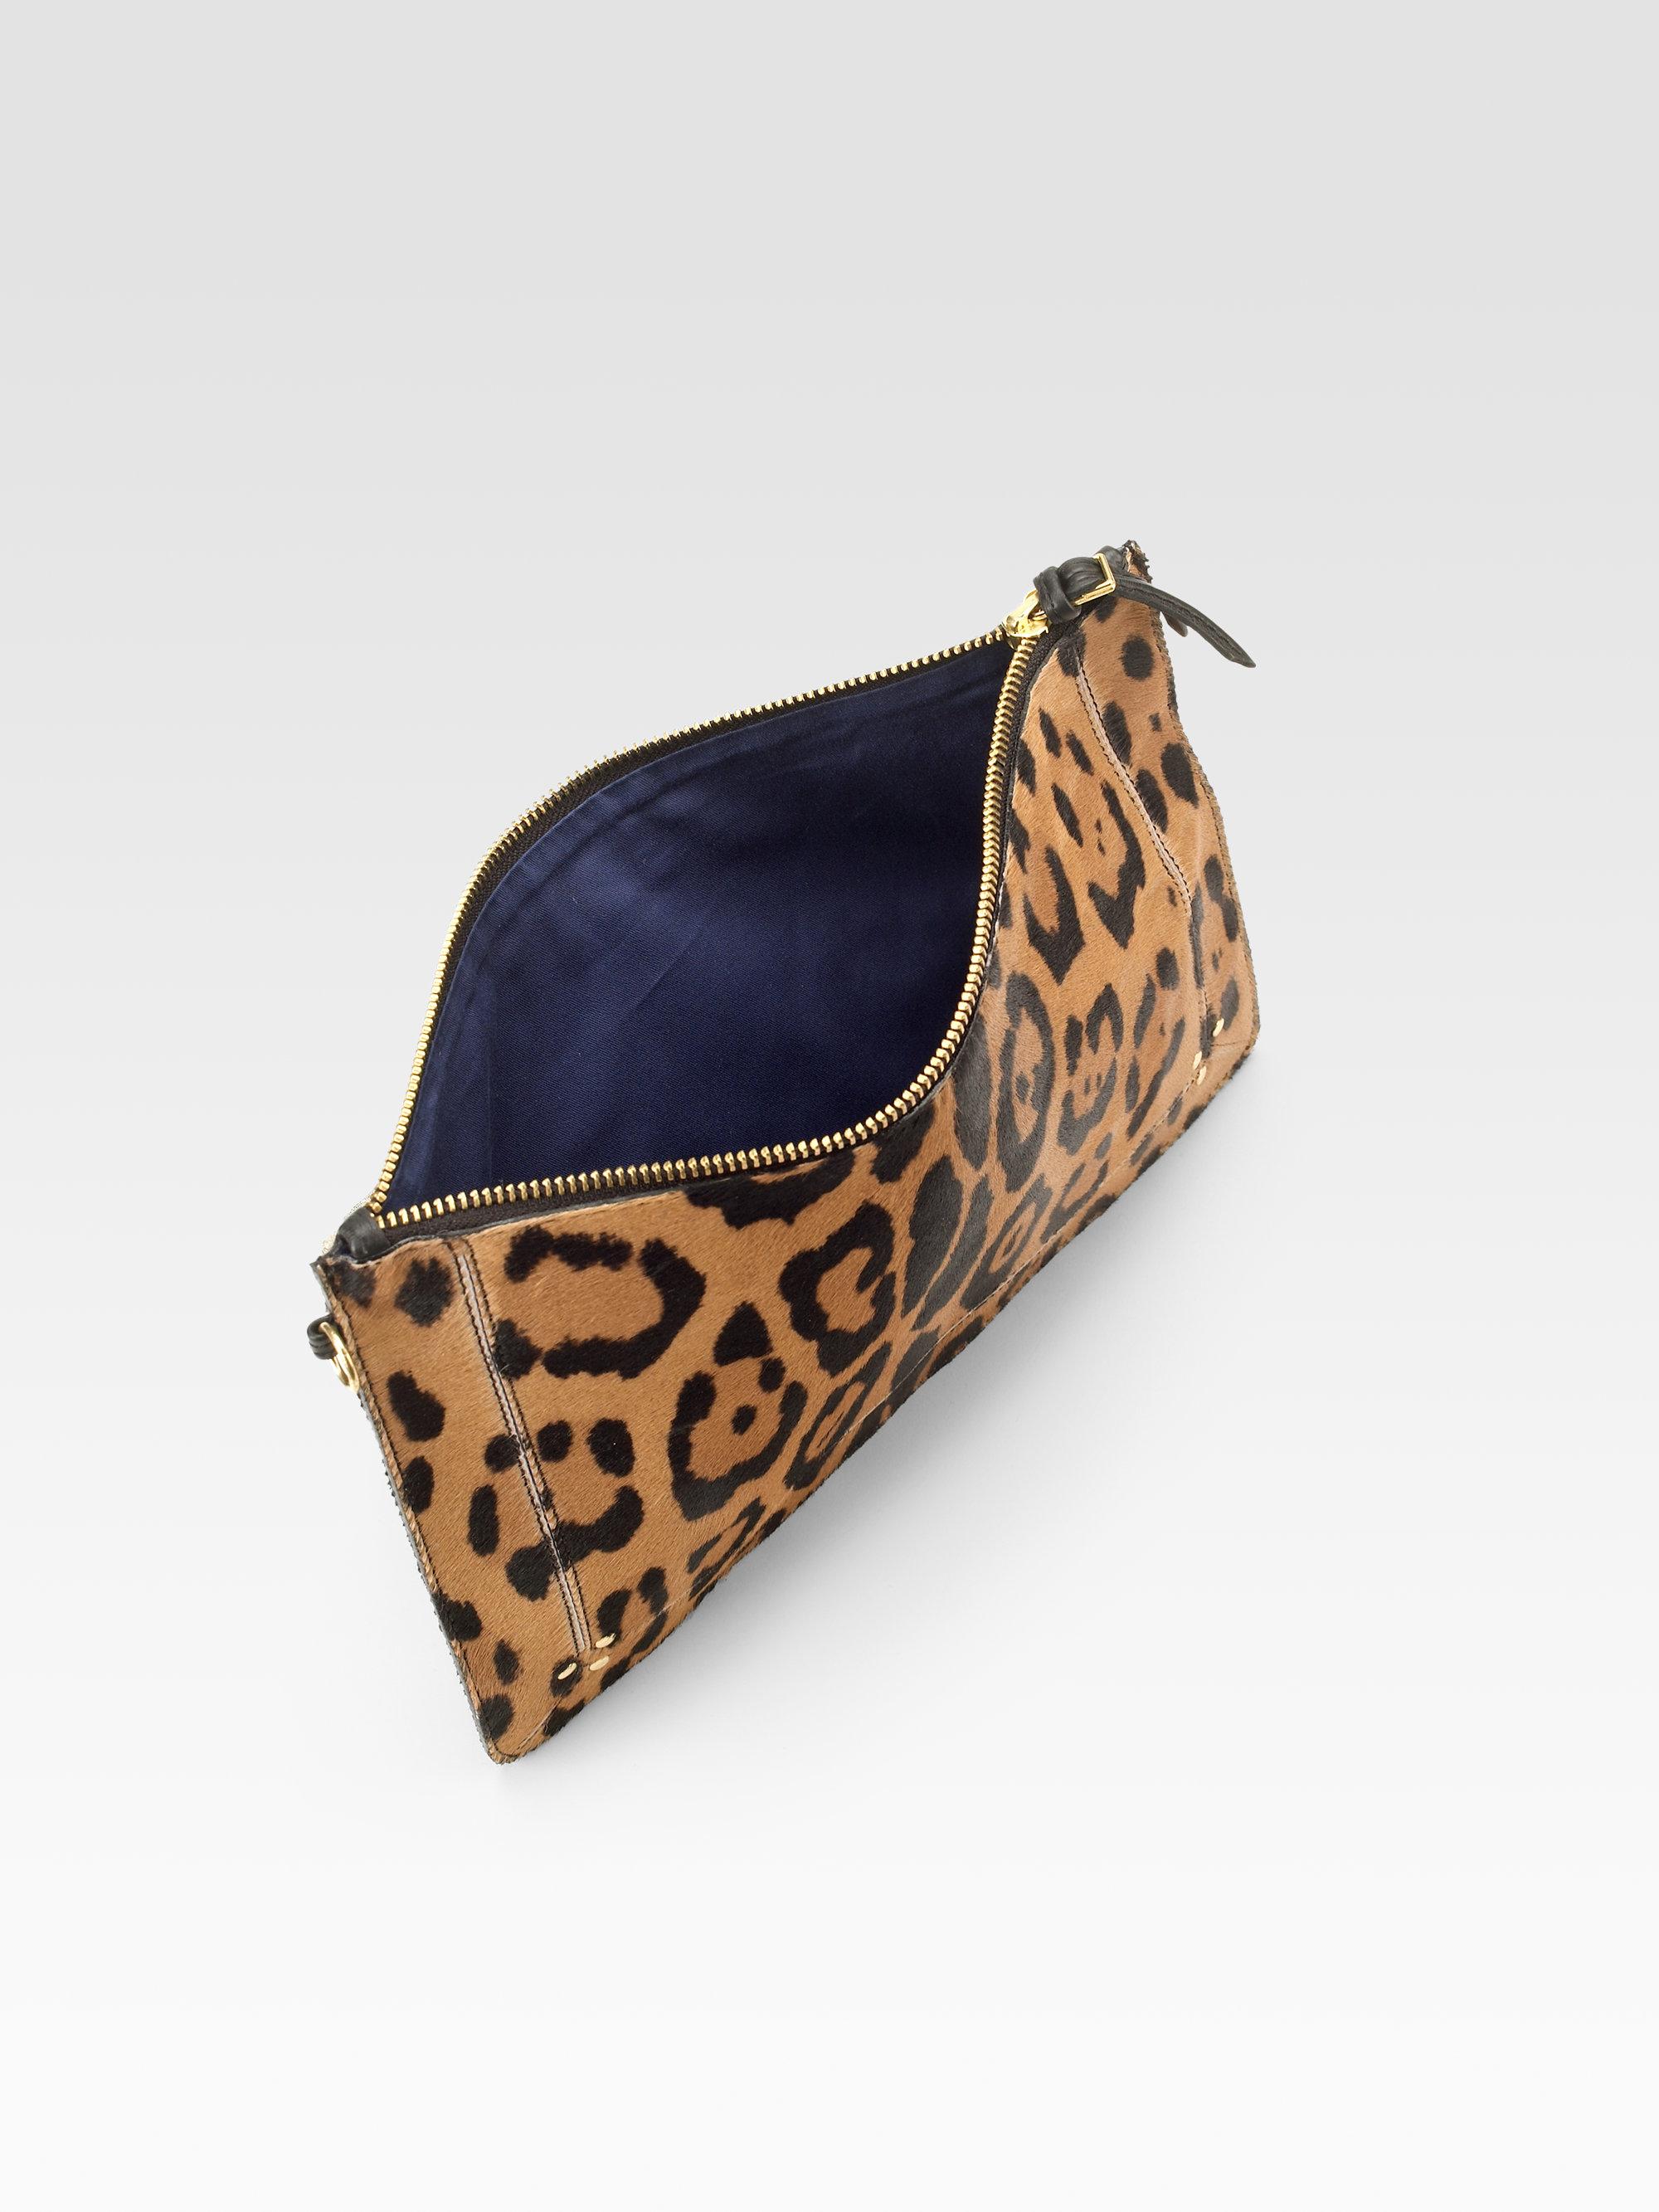 db077f6de944 Jérôme Dreyfuss Popoche Large Leopard-Print Calf Hair Clutch in ...